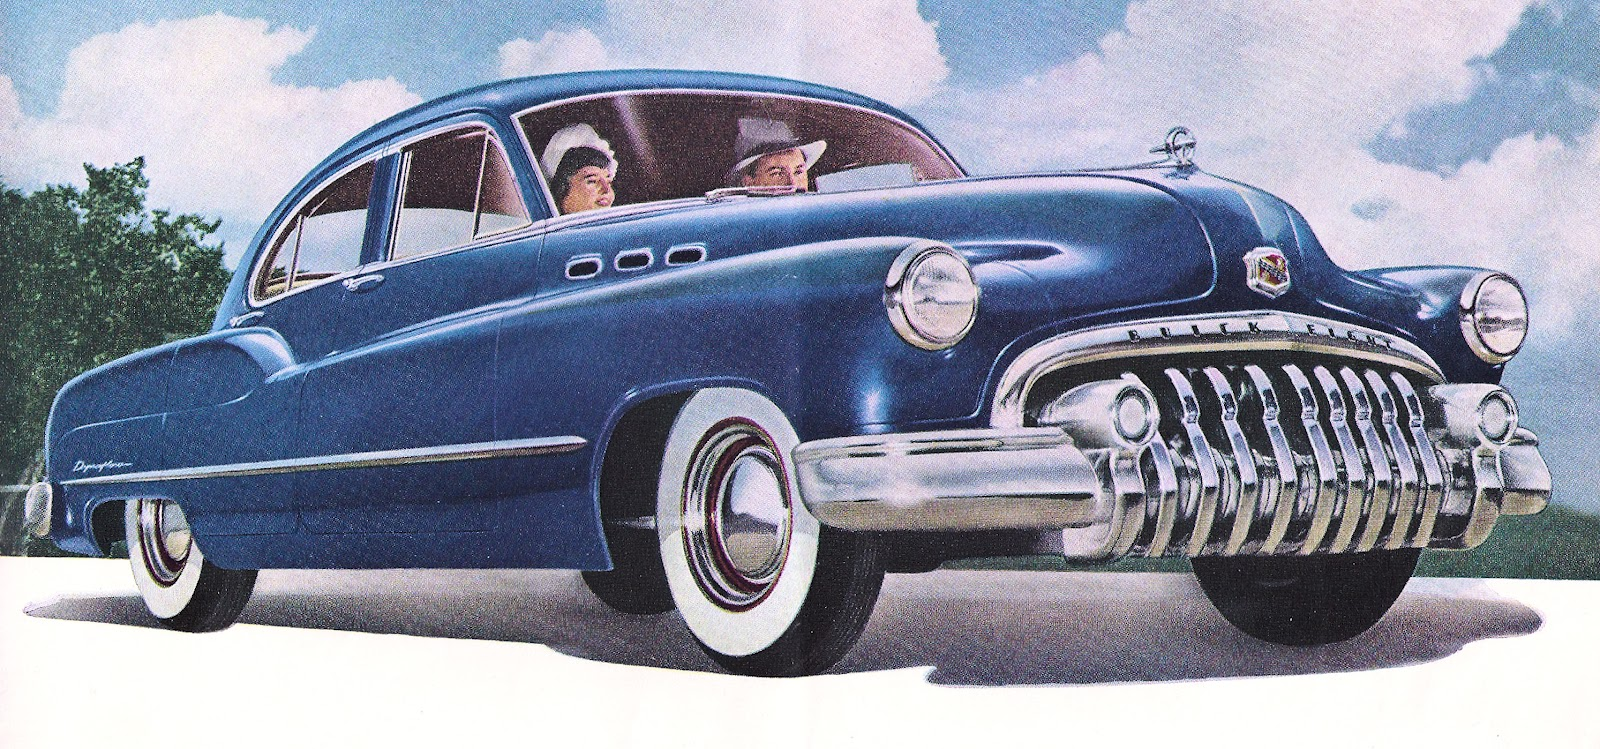 1950buickblue.jpg